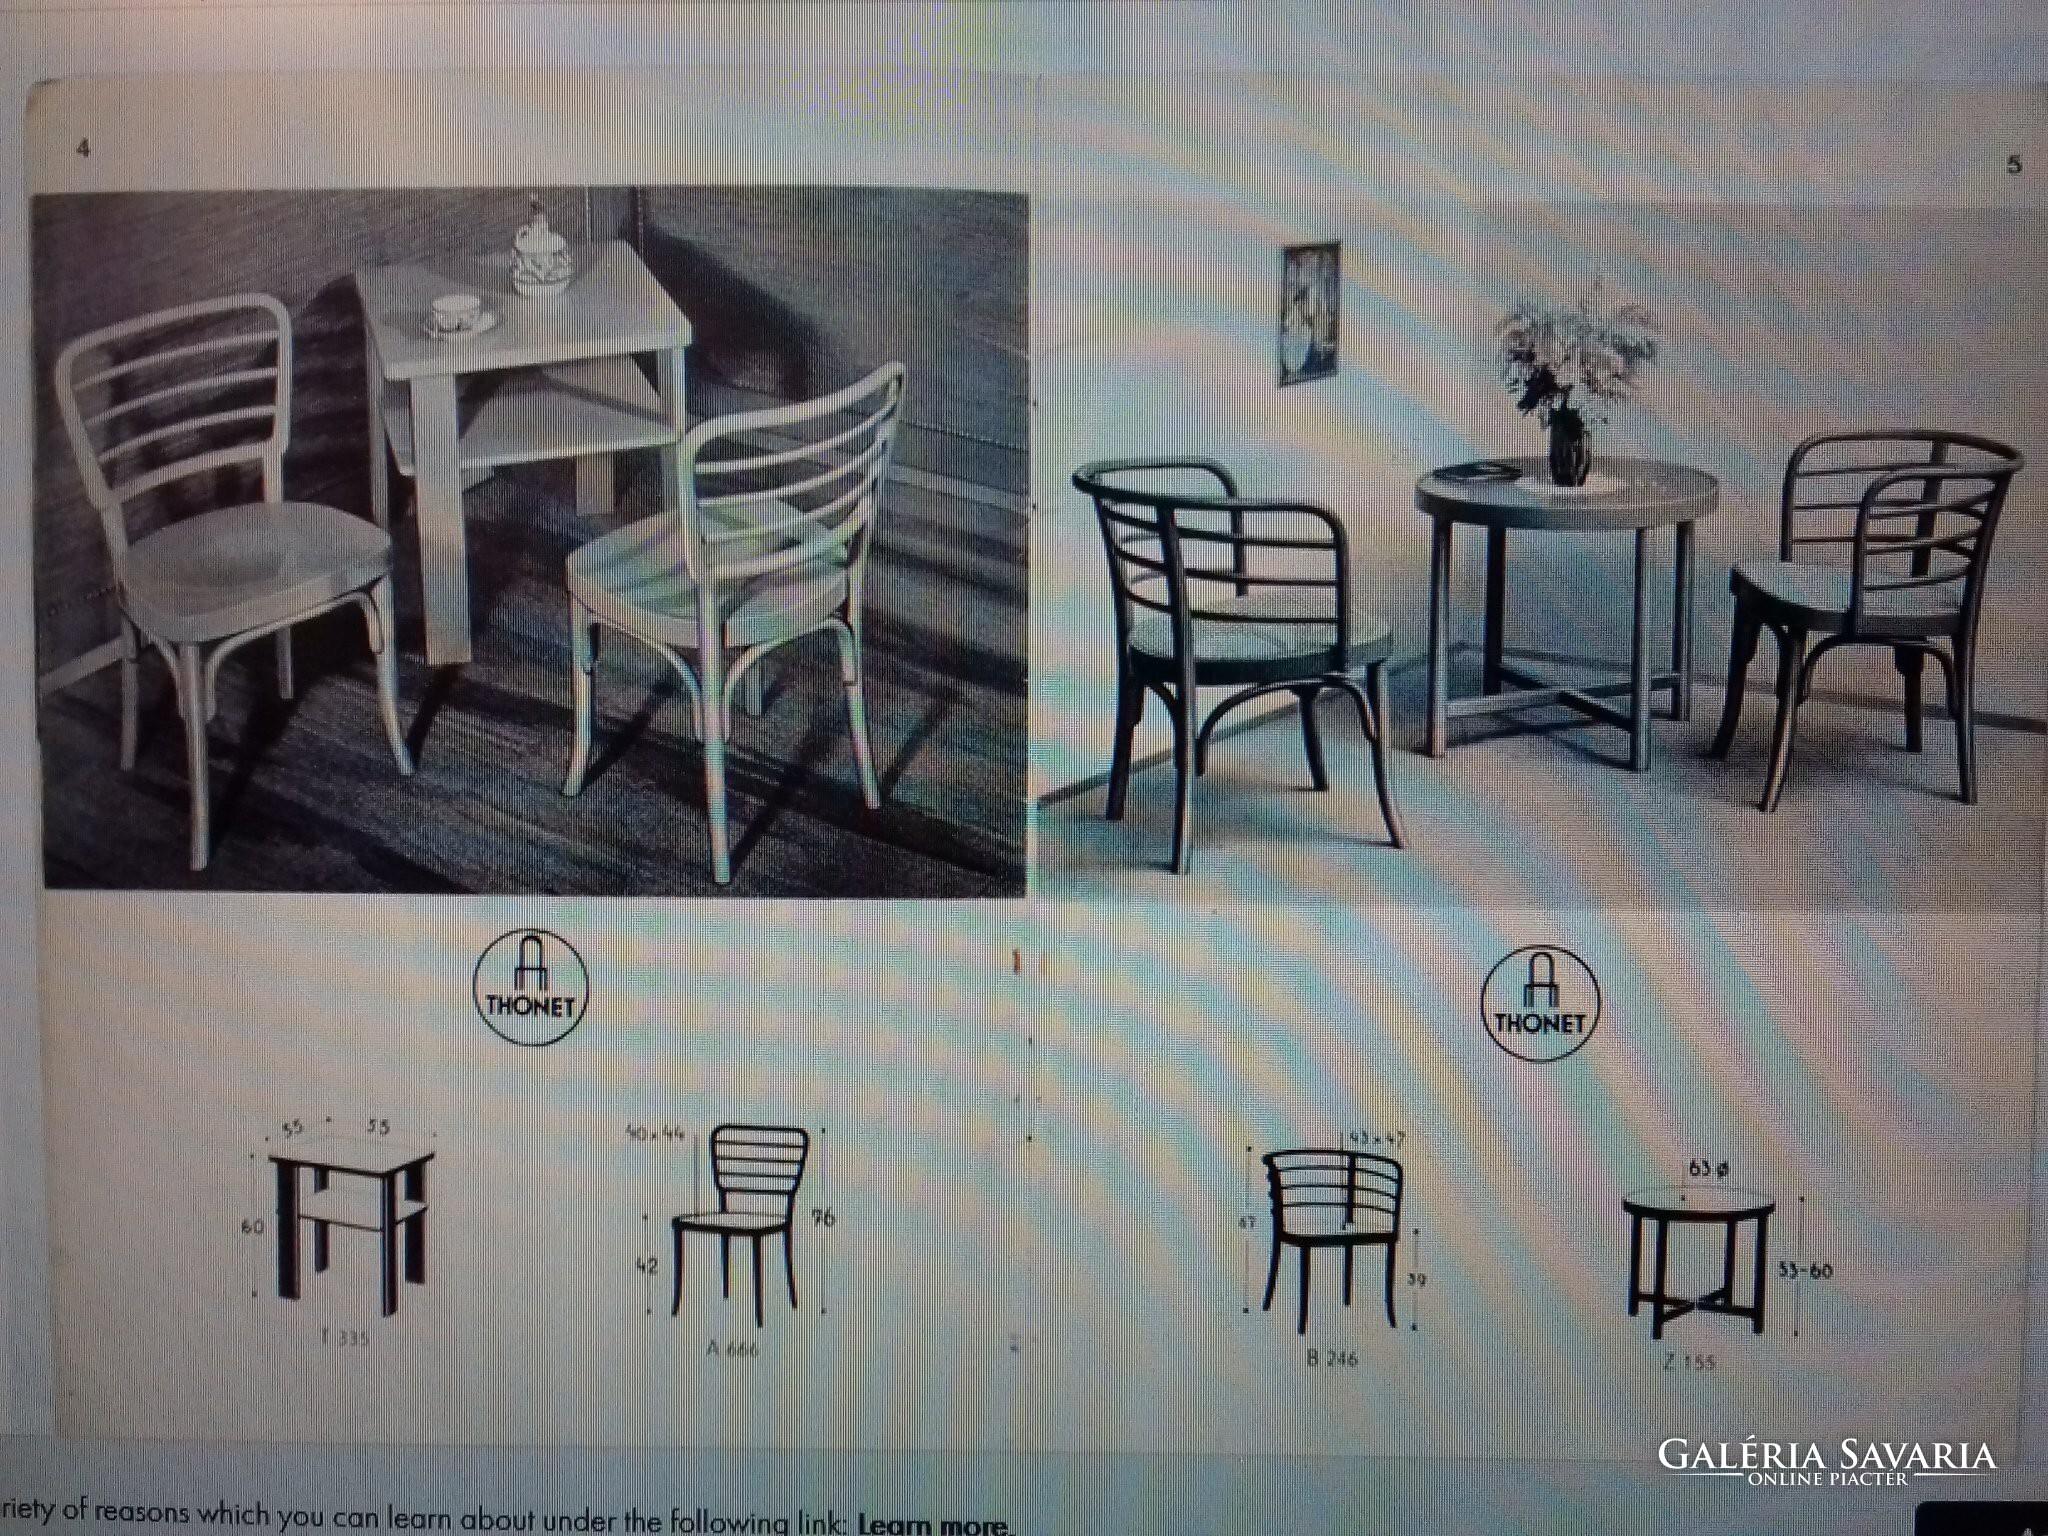 Josef Frank Designed A Thonet Beech Armchair From The 1930s